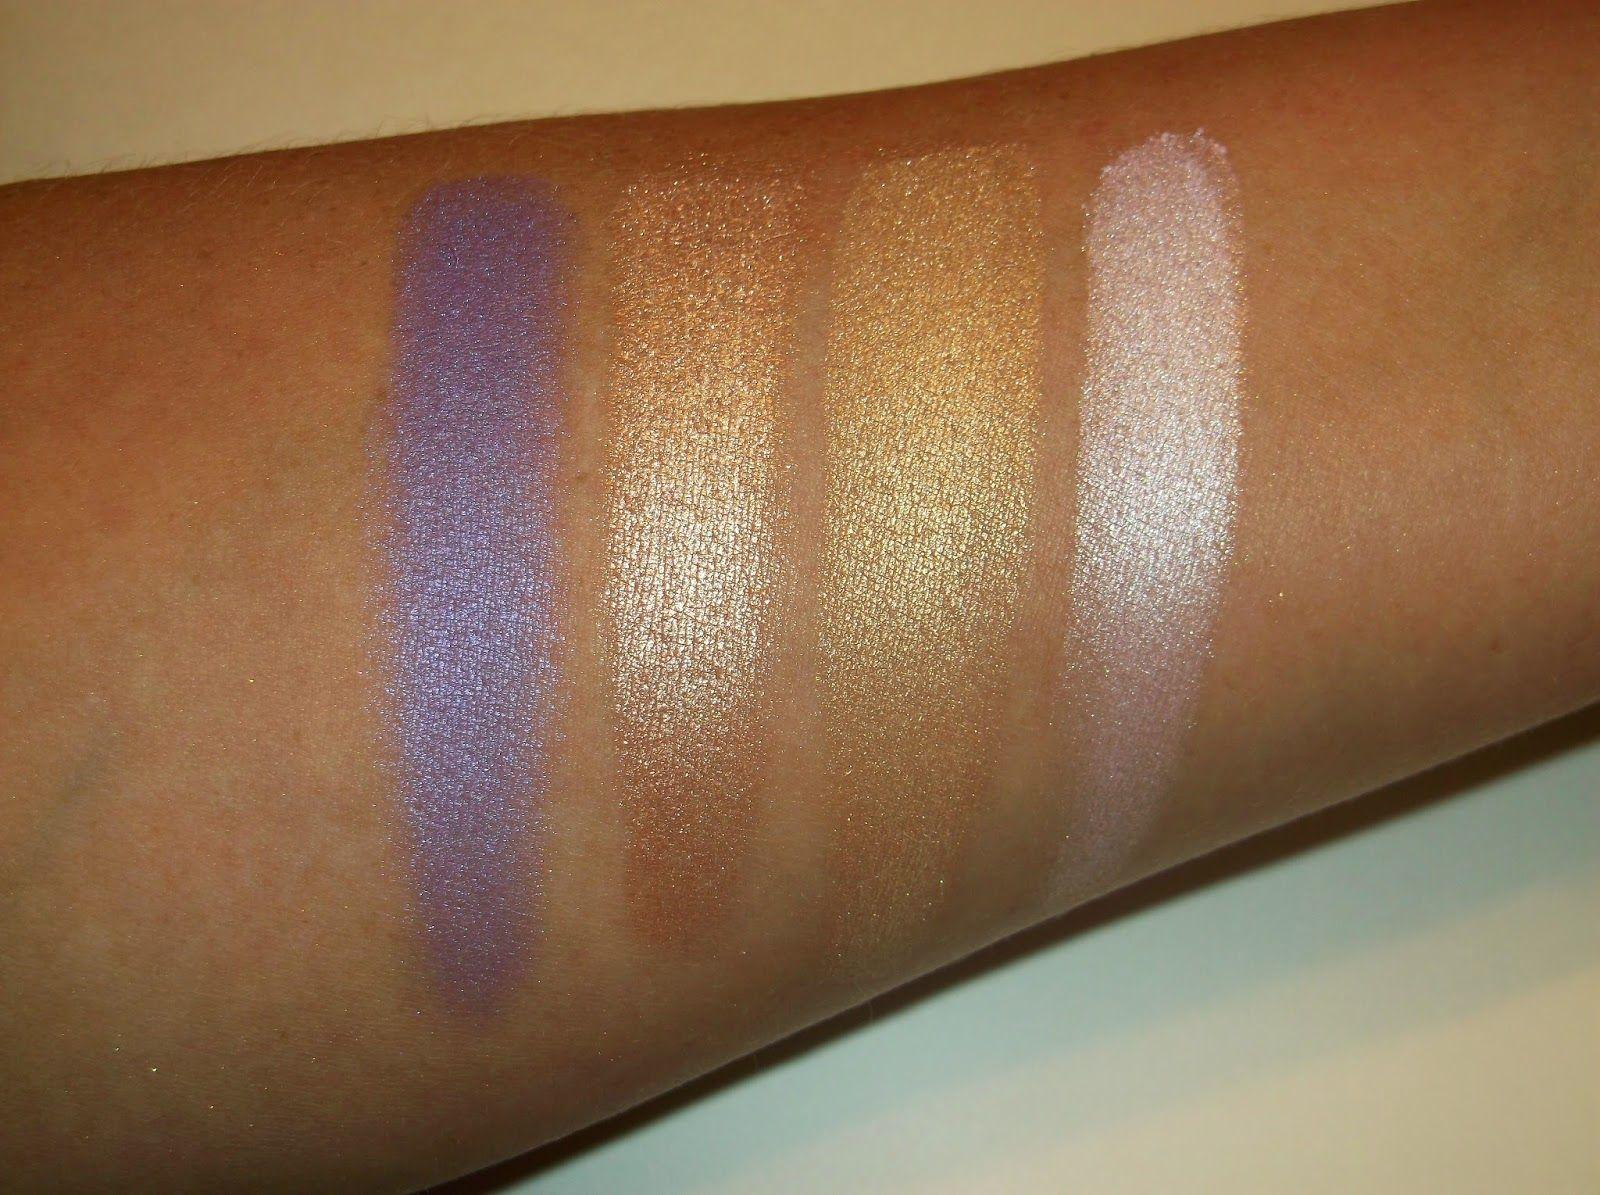 Eyeshadow Primer by Milani #19